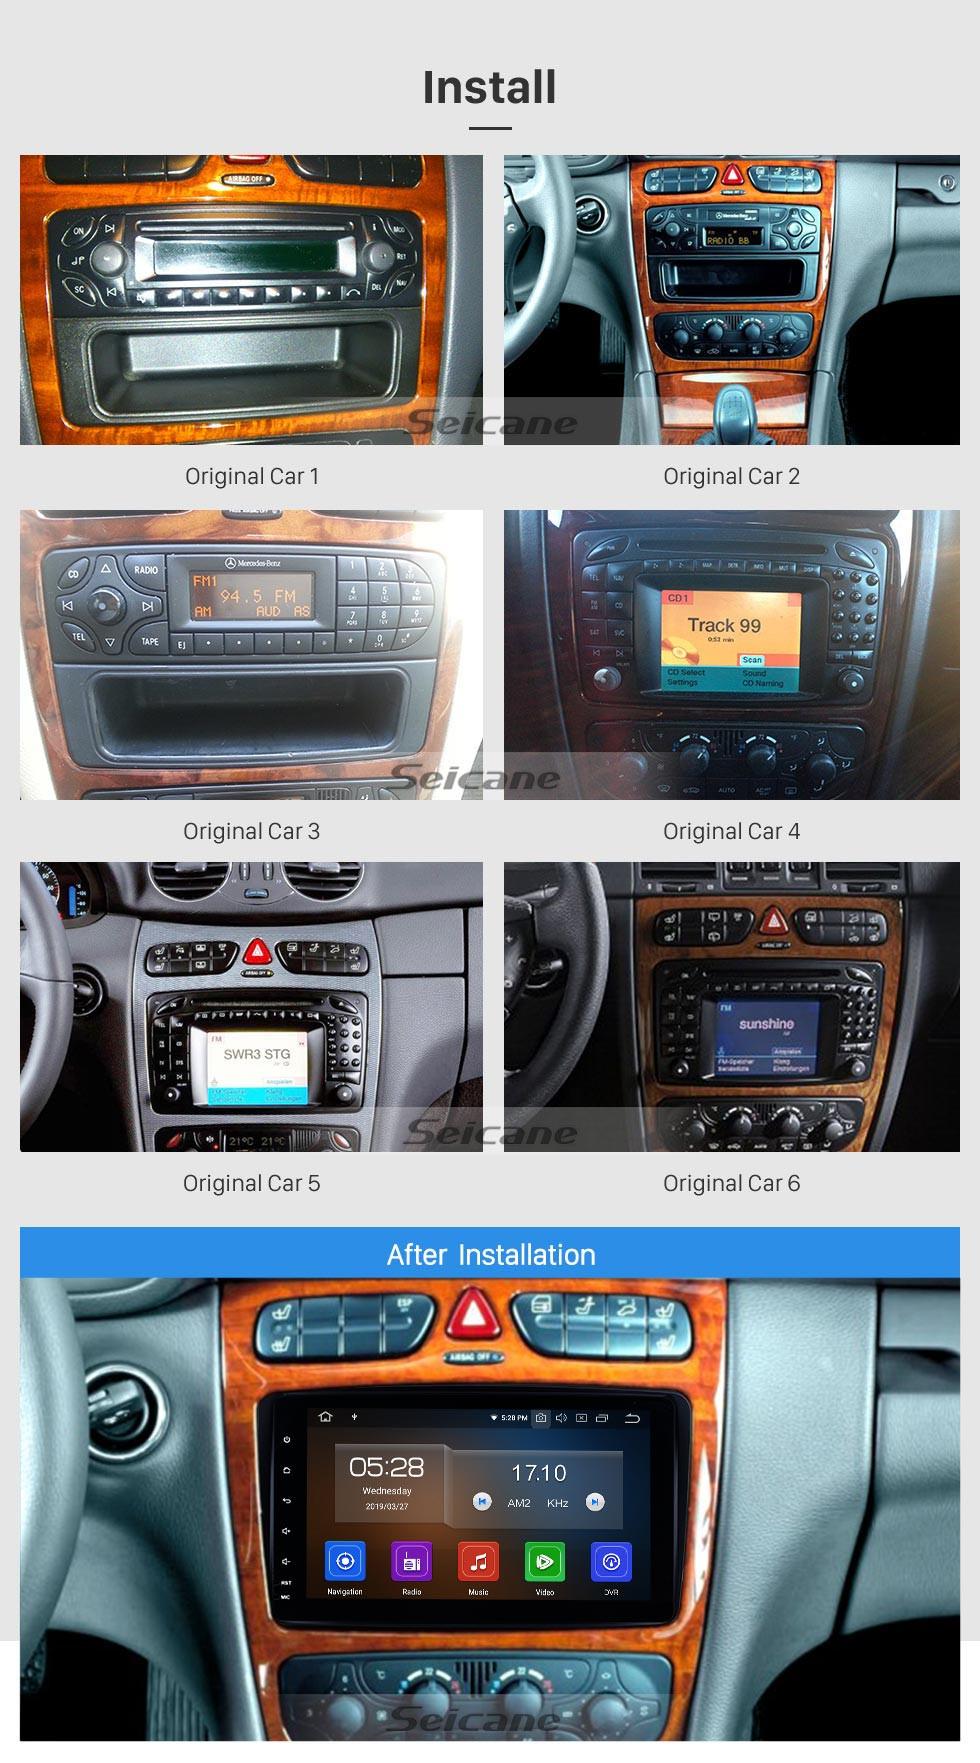 Seicane 8 pulgadas HD con pantalla táctil Android 9.0 1998-2004 Mercedes-Benz CLK clase W209 CLK200 CLK230 CLK320 CLK430 CLK55 Teléfono Bluetooth Navegación GPS Radio para coche con USB Mirror Link WIFI 1080P Video Control del volante